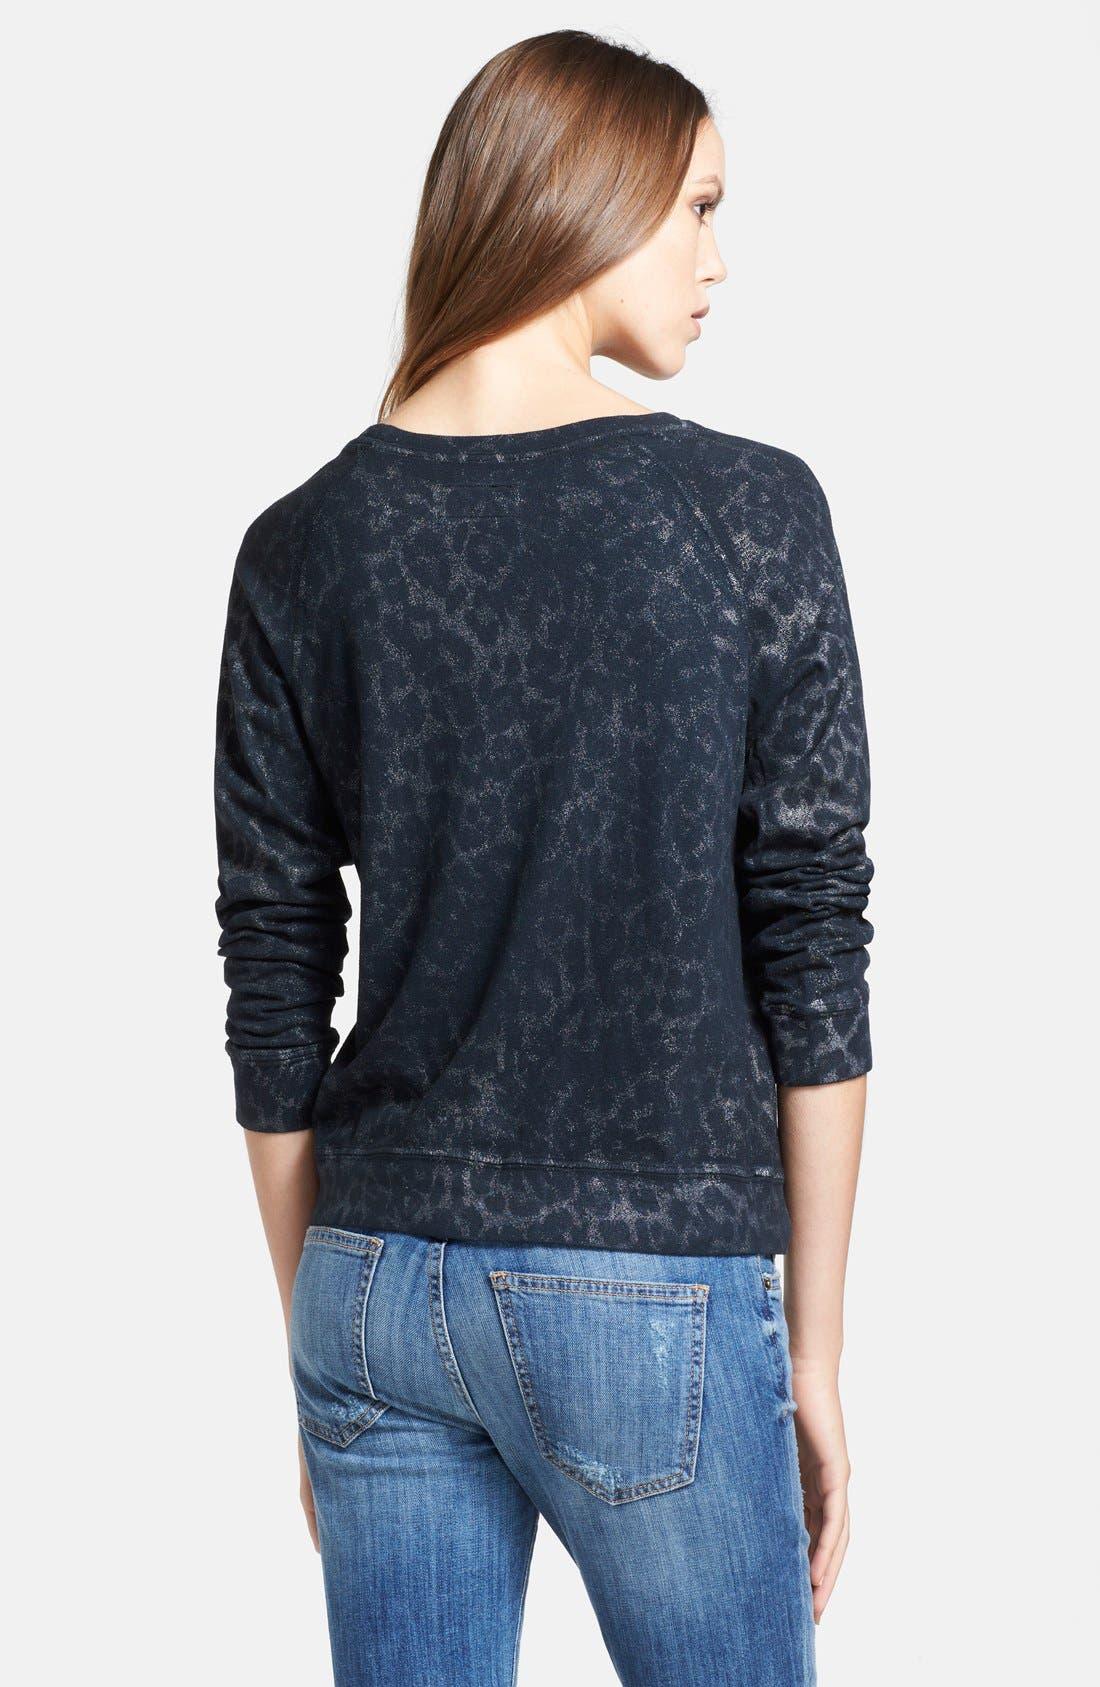 Alternate Image 2  - Current/Elliott 'The Letterman' Print Destroyed Sweatshirt